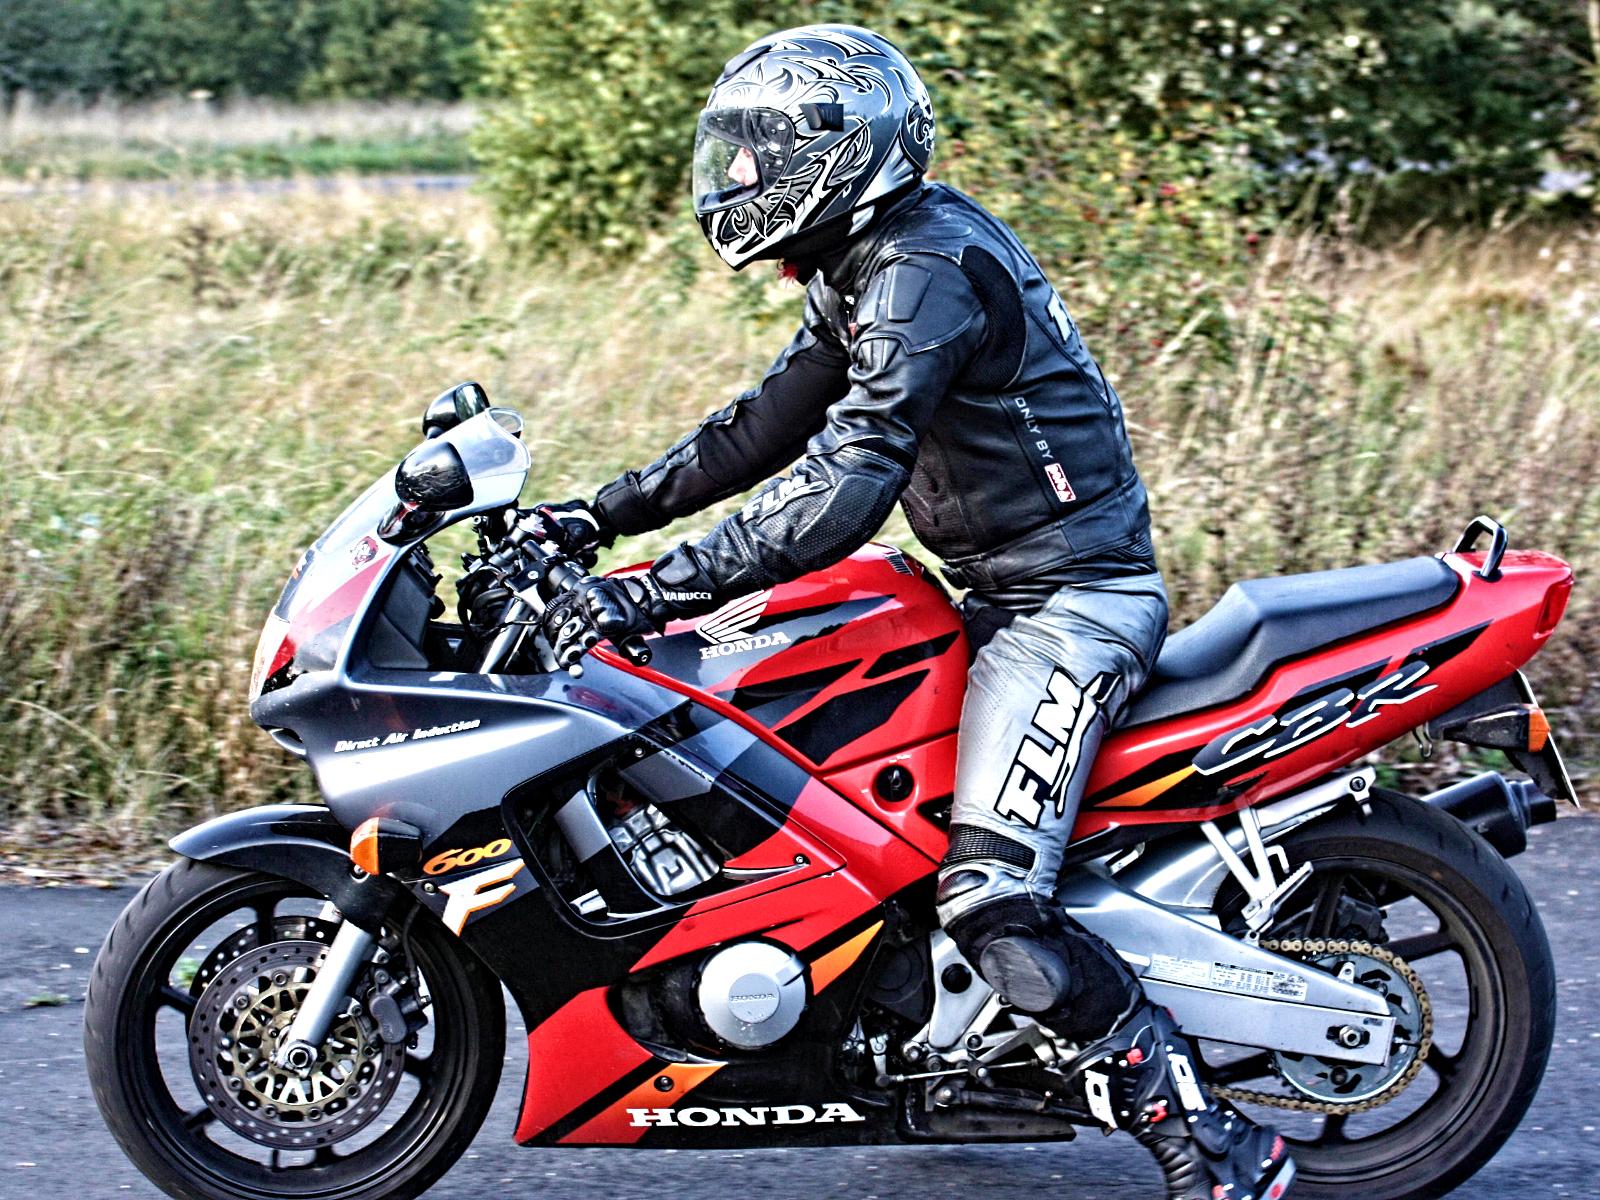 Картинки мотоциклов и водителей